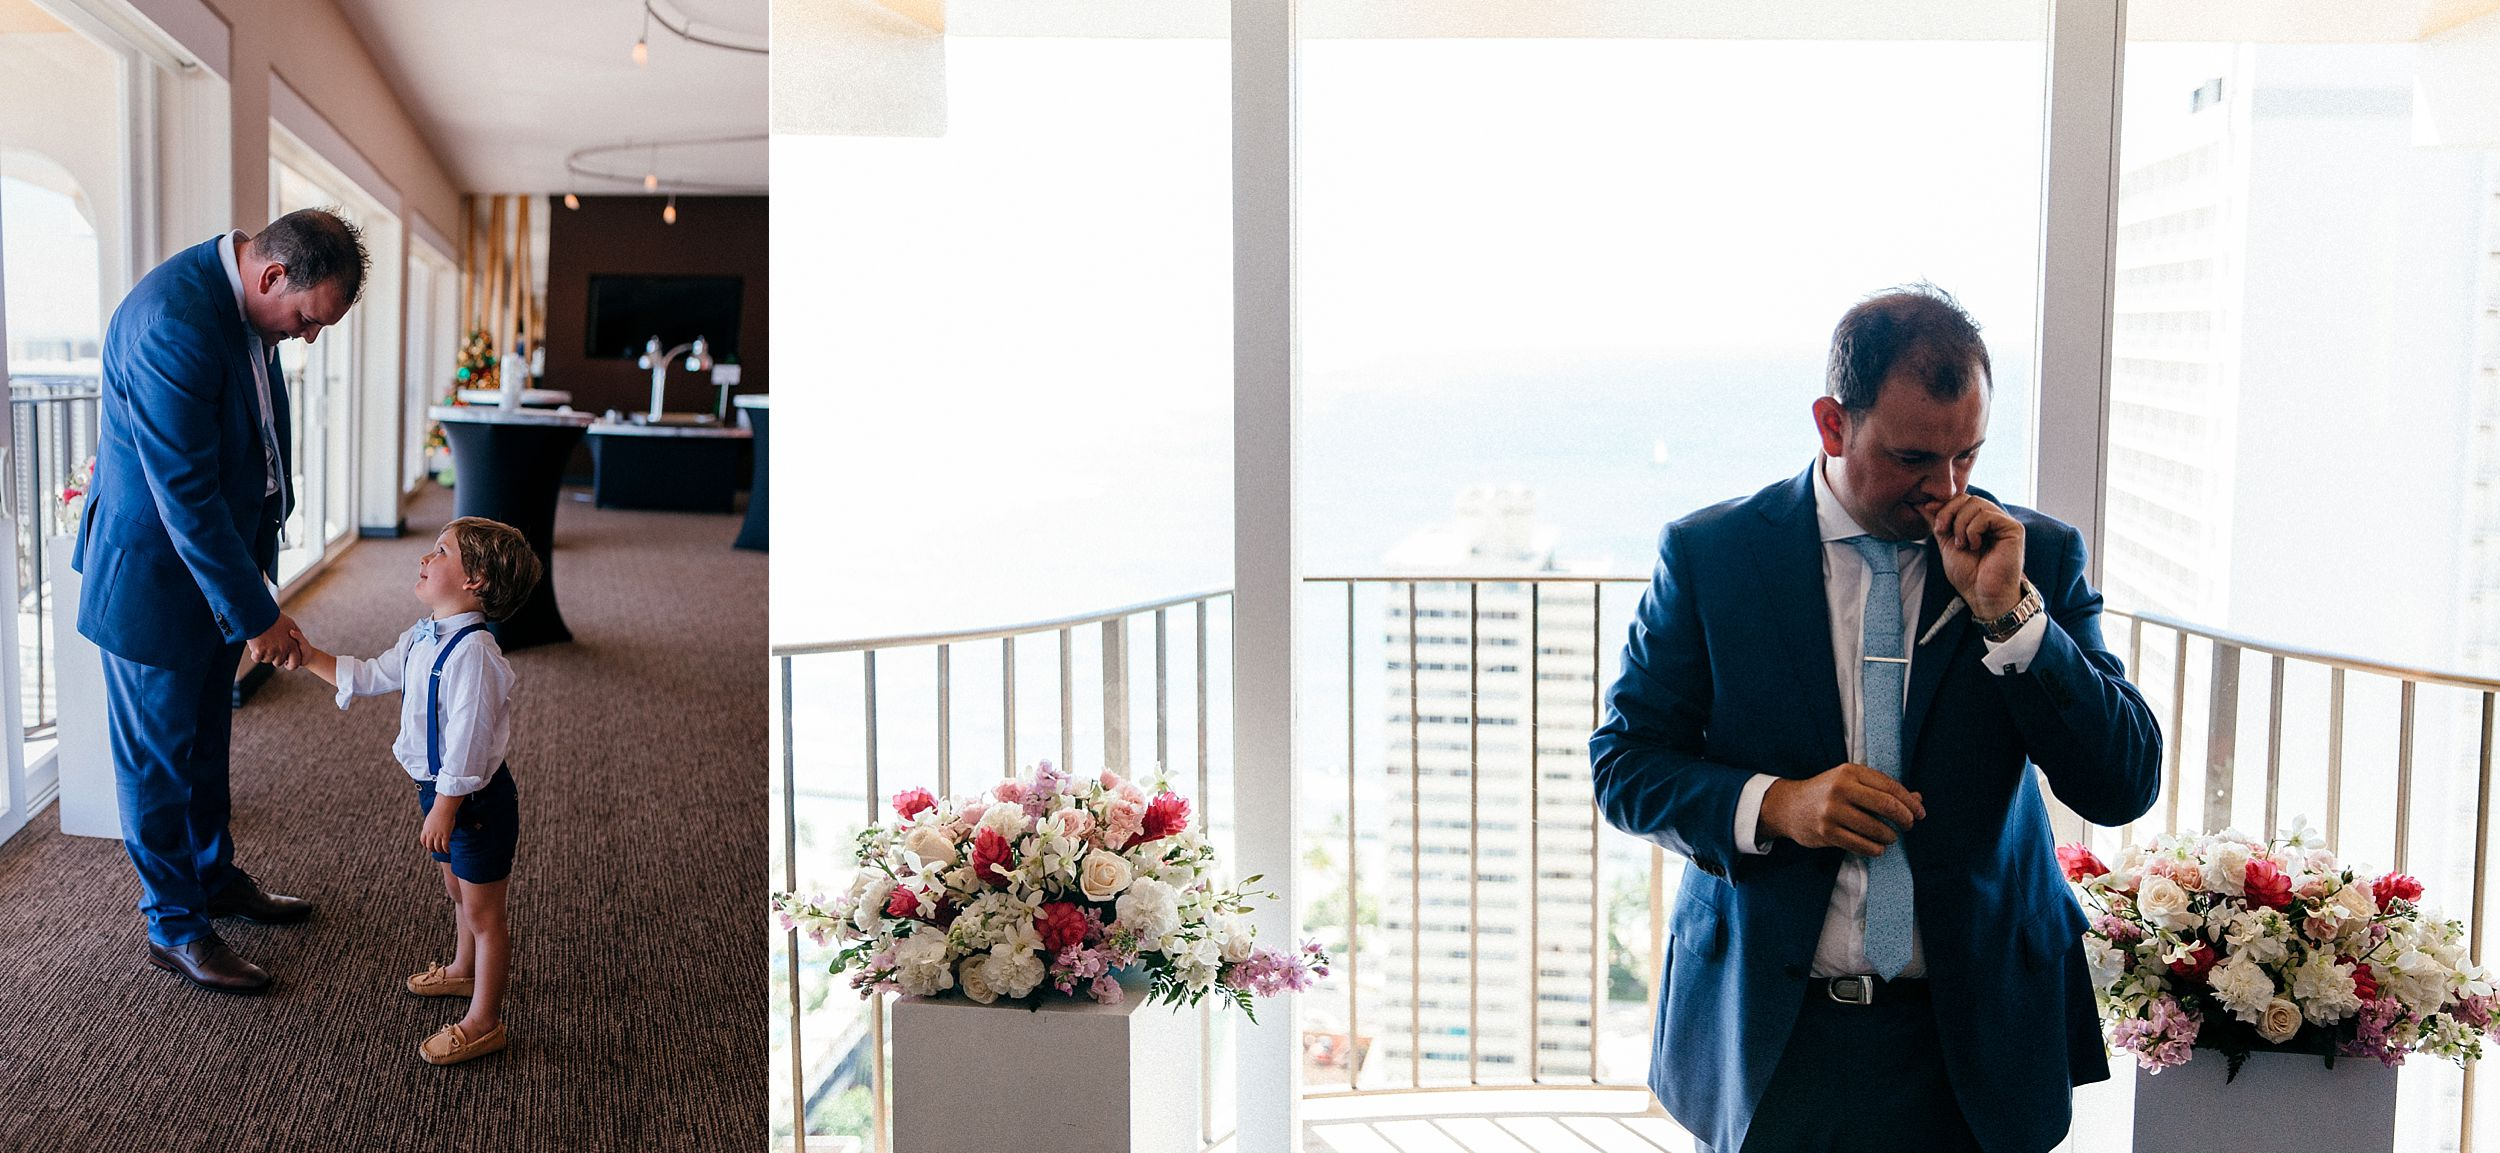 Small personal, emotional Hawaii Elopement at Hilton Waikiki in Altitude 37